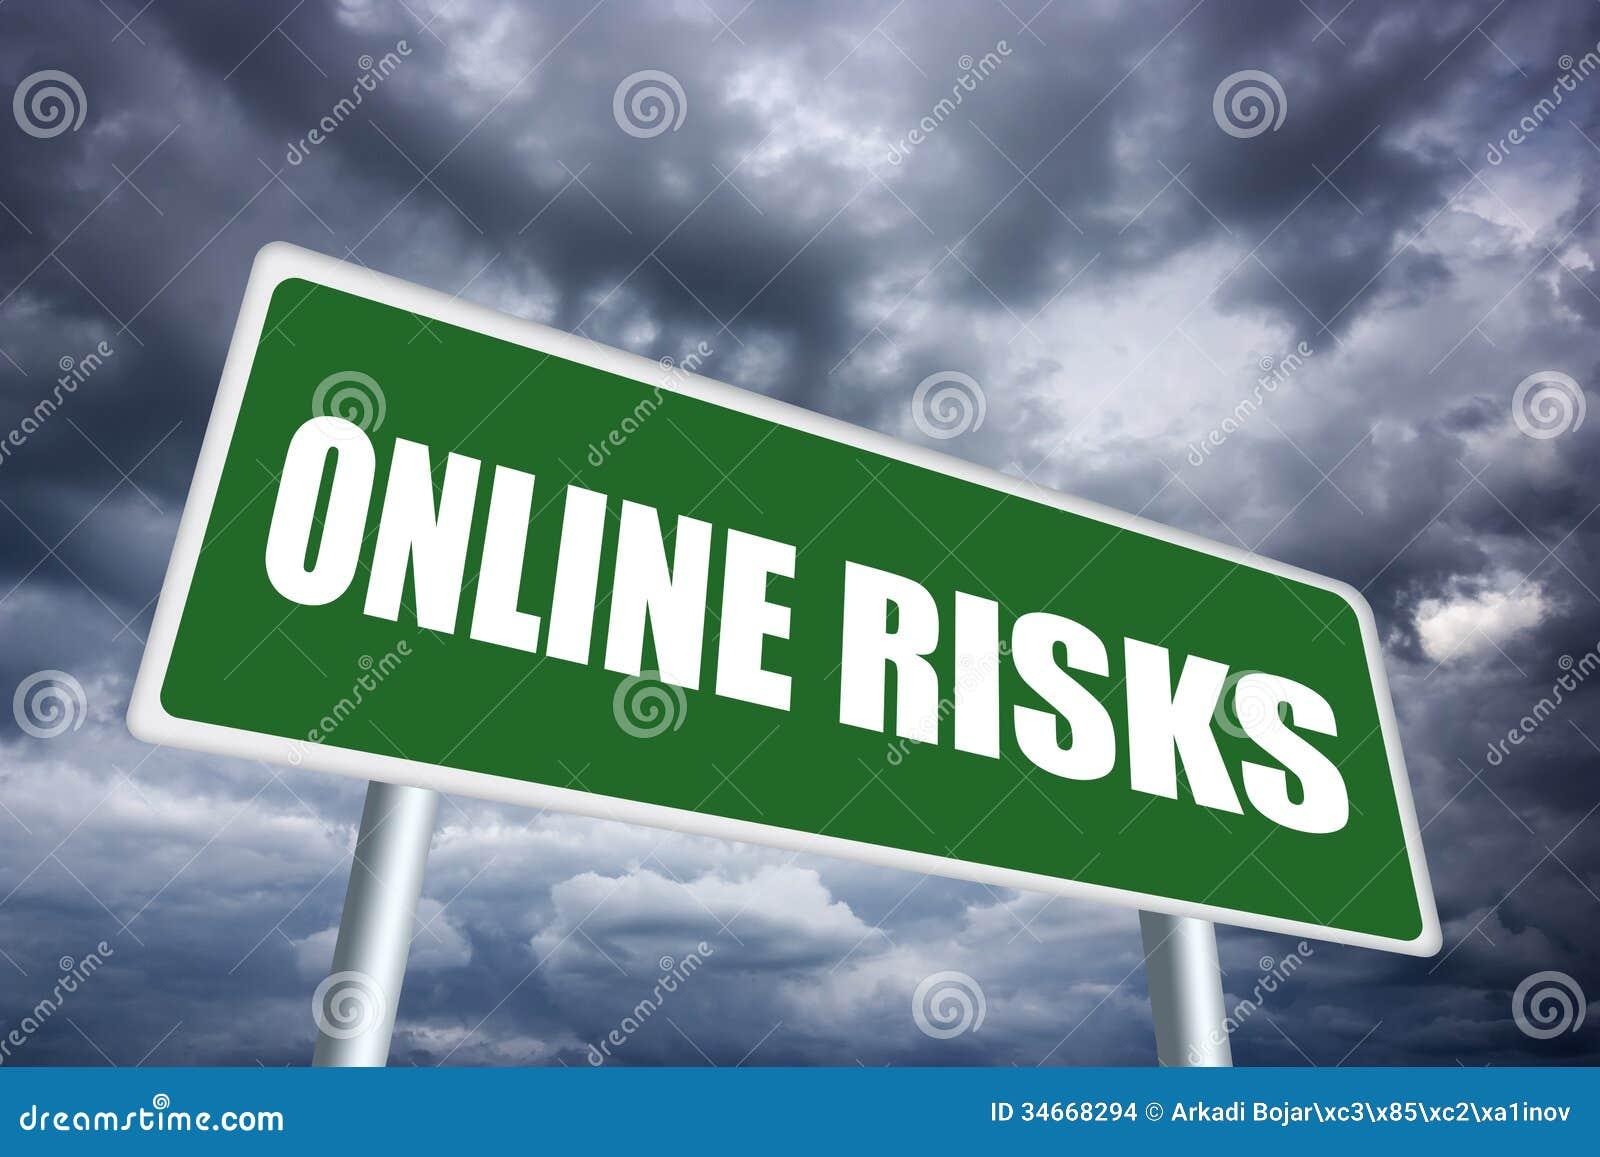 Internet risk